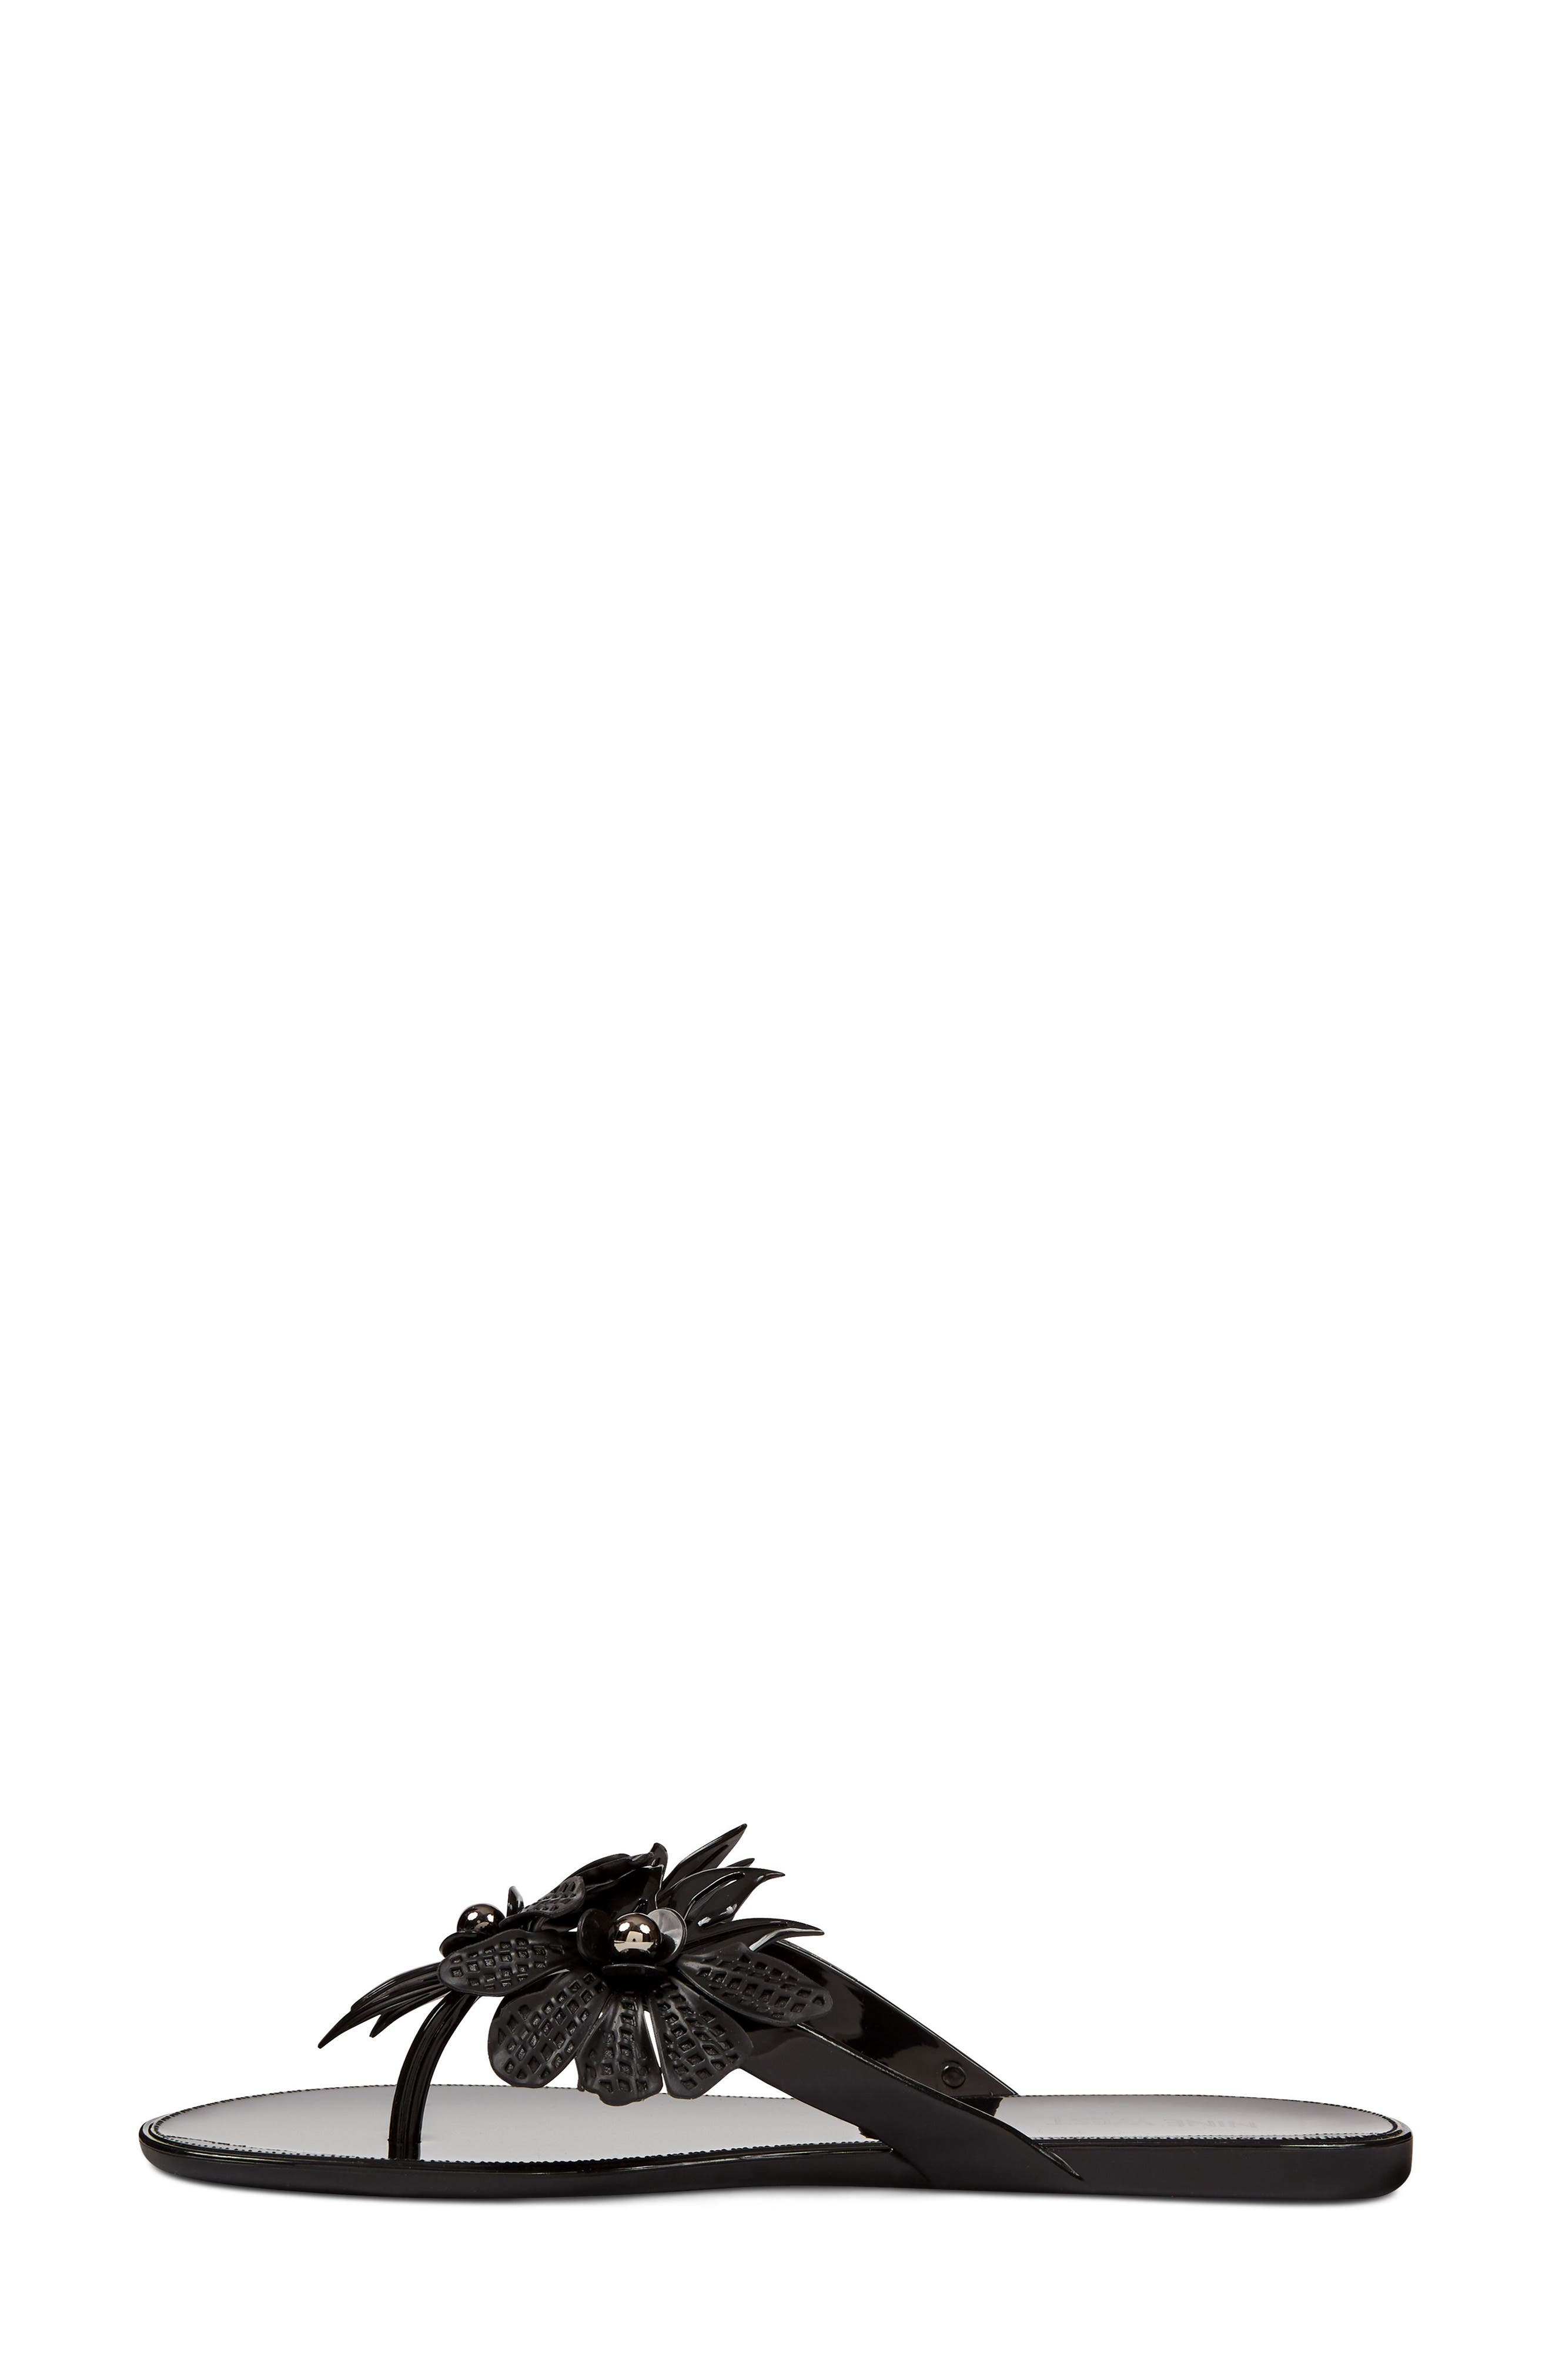 Macinee Thong Sandal,                             Alternate thumbnail 2, color,                             001